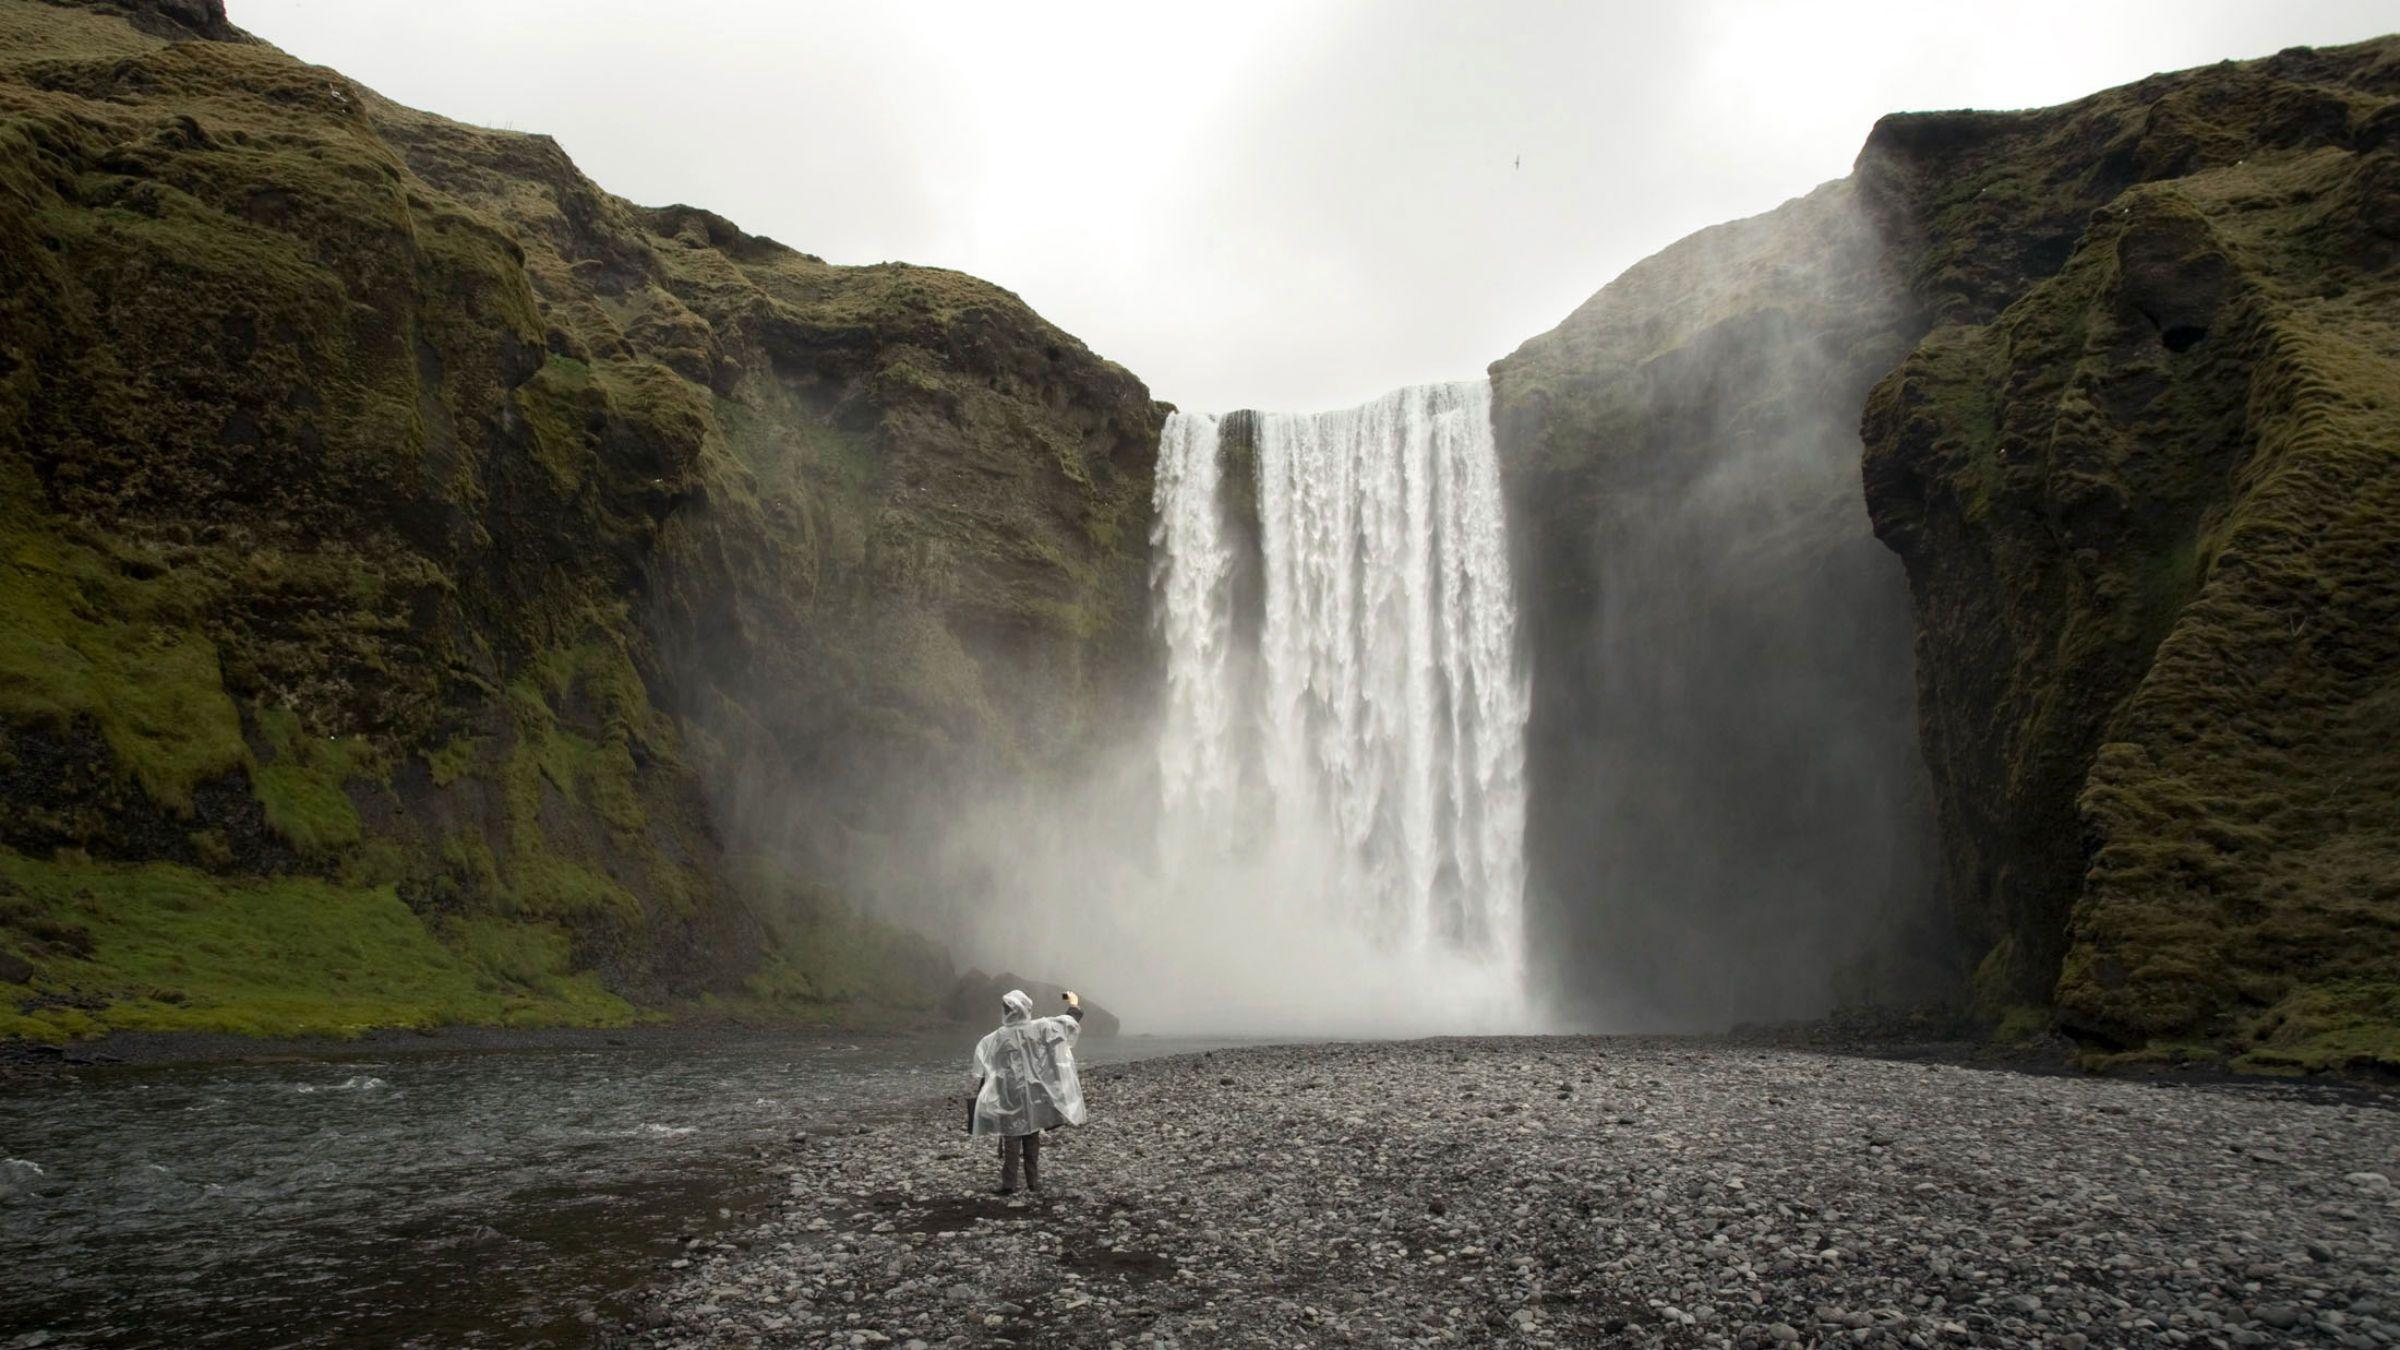 A tourist takes photos of Skogafoss waterfall near Skogar on Iceland's southern coast May 10, 2008.